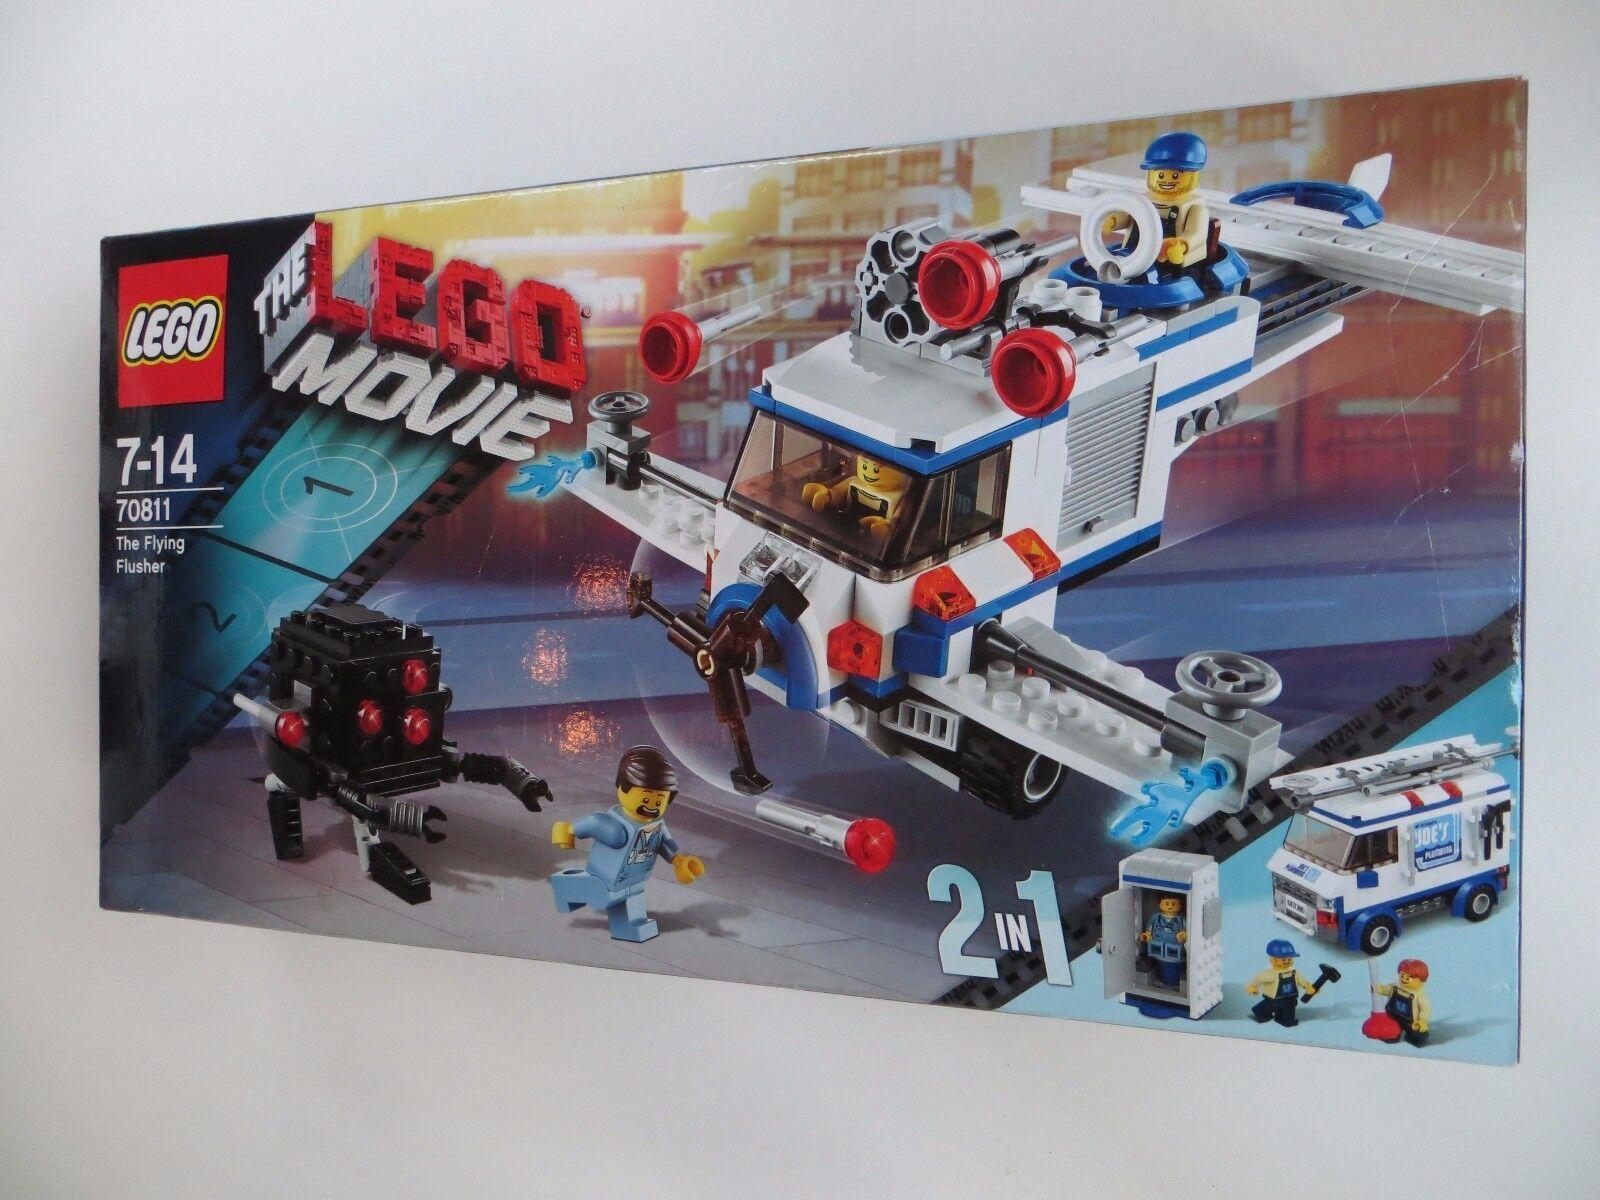 New Sealed The Lego Movie 70811 The Flying Flusher